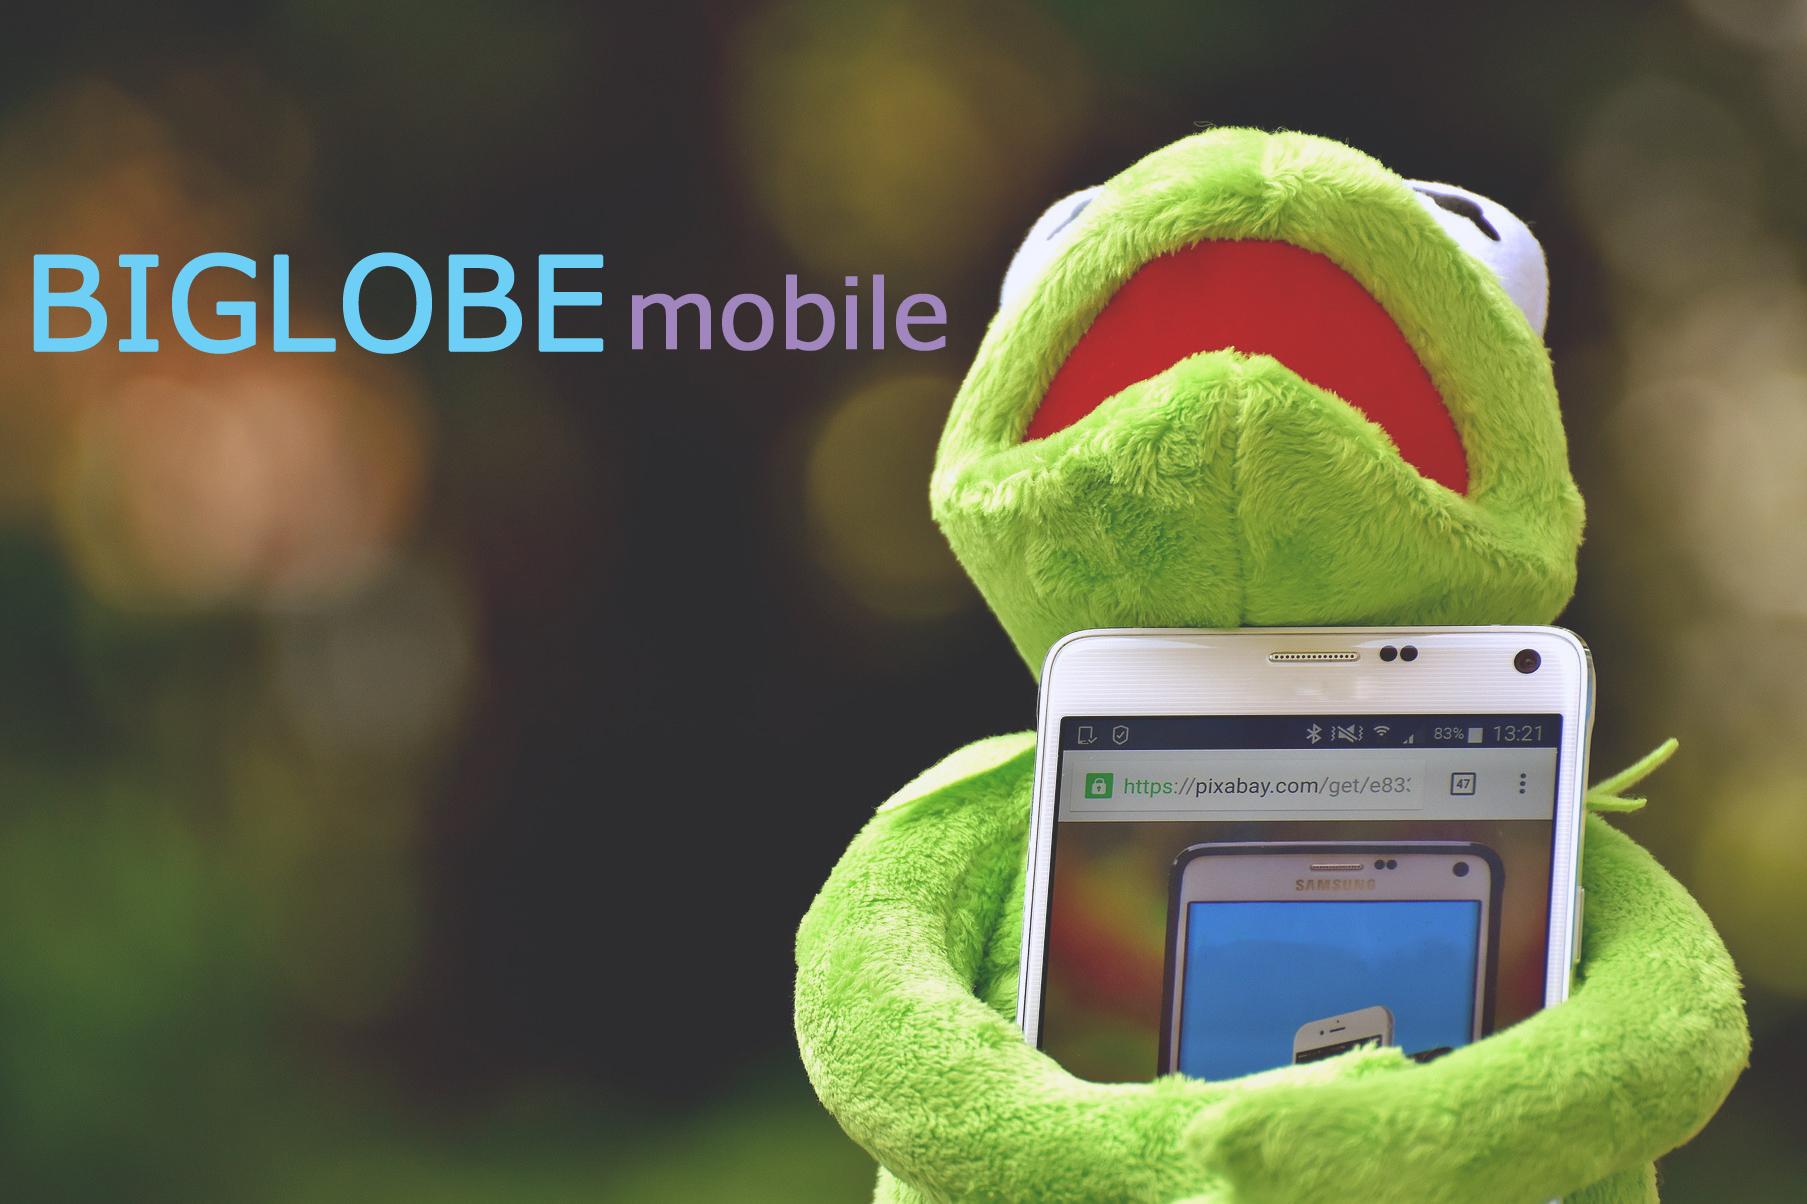 BIGLOBEモバイル